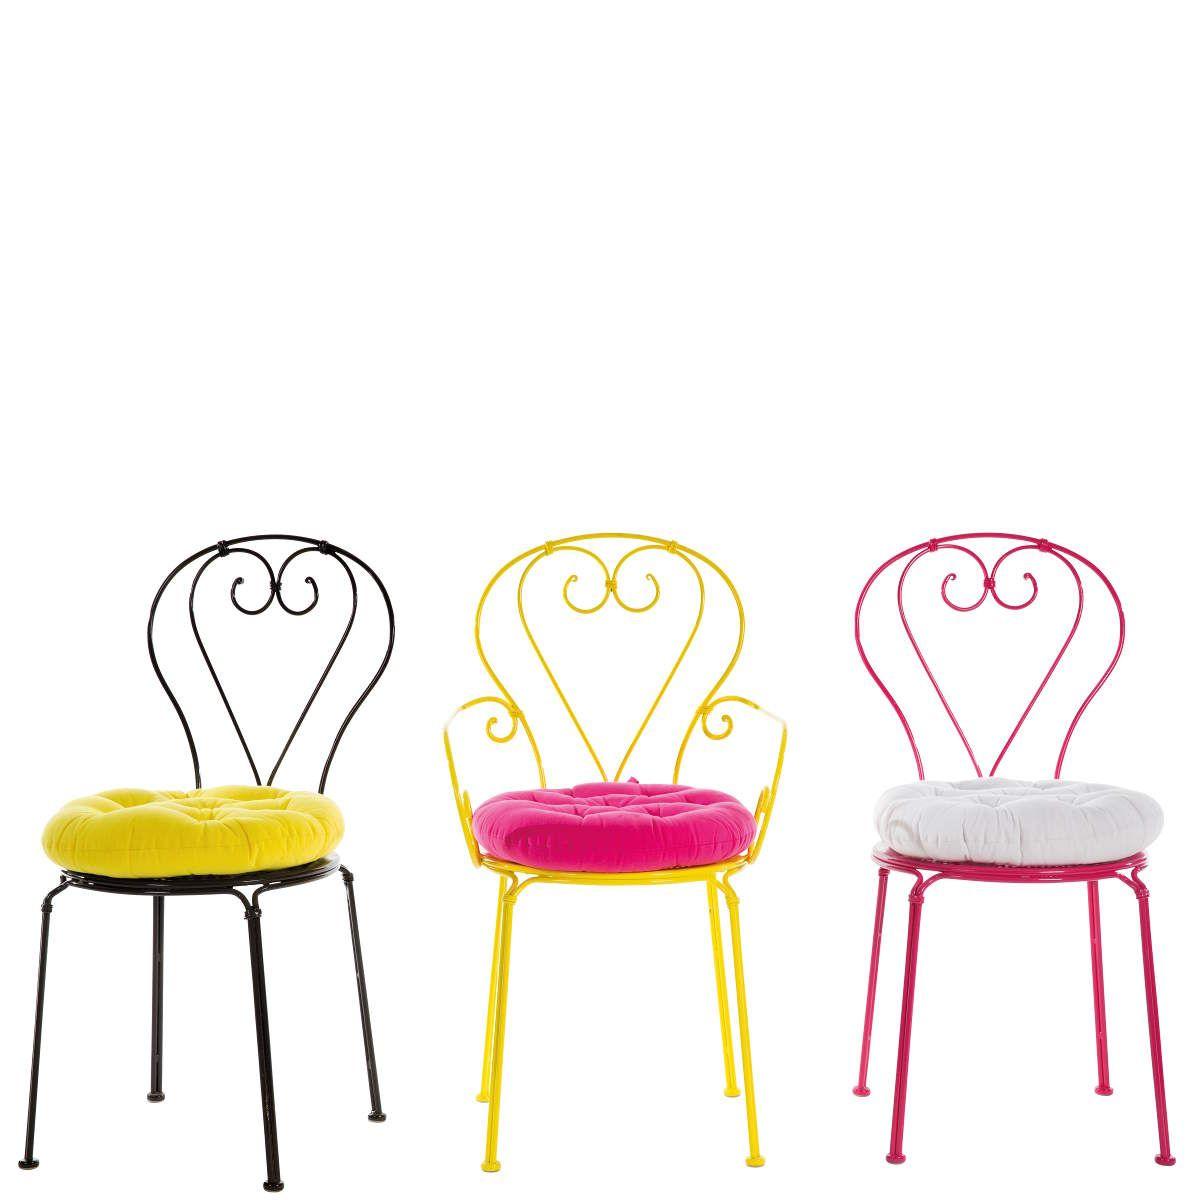 Century Stuhl Gartenmöbel Butlers | Garten | Pinterest ...